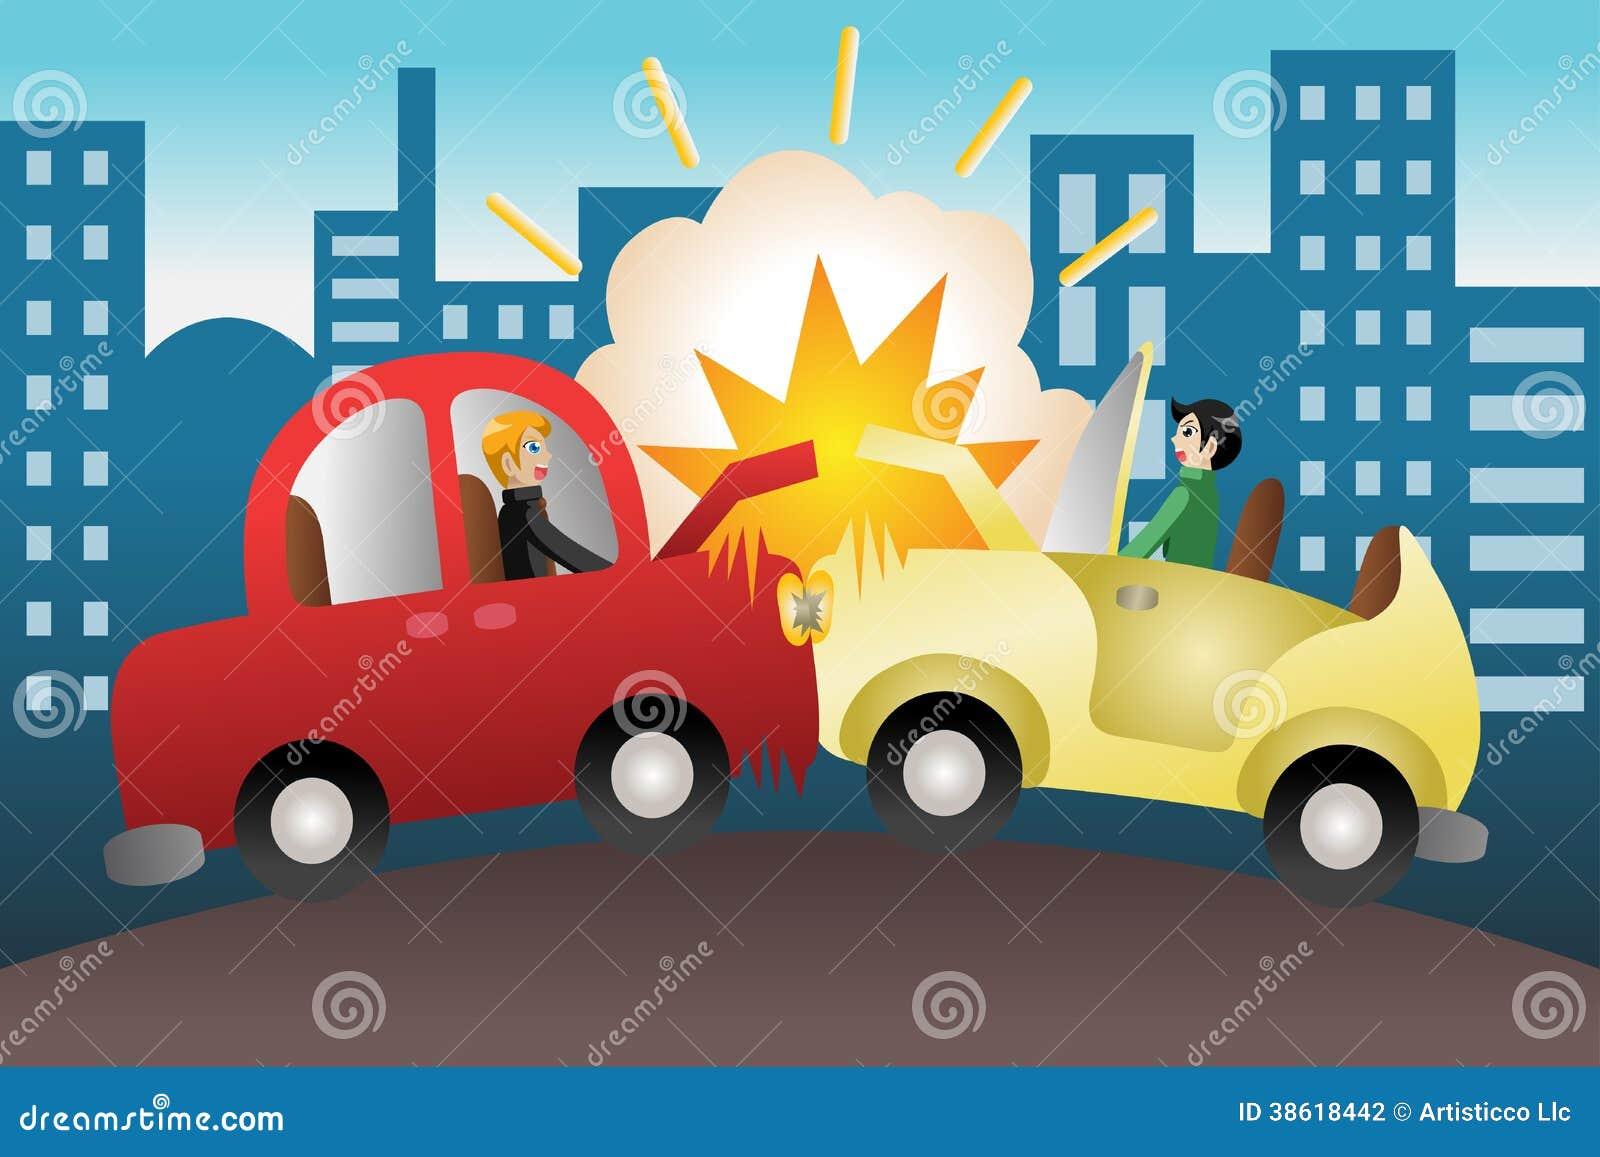 free clipart auto accident - photo #39